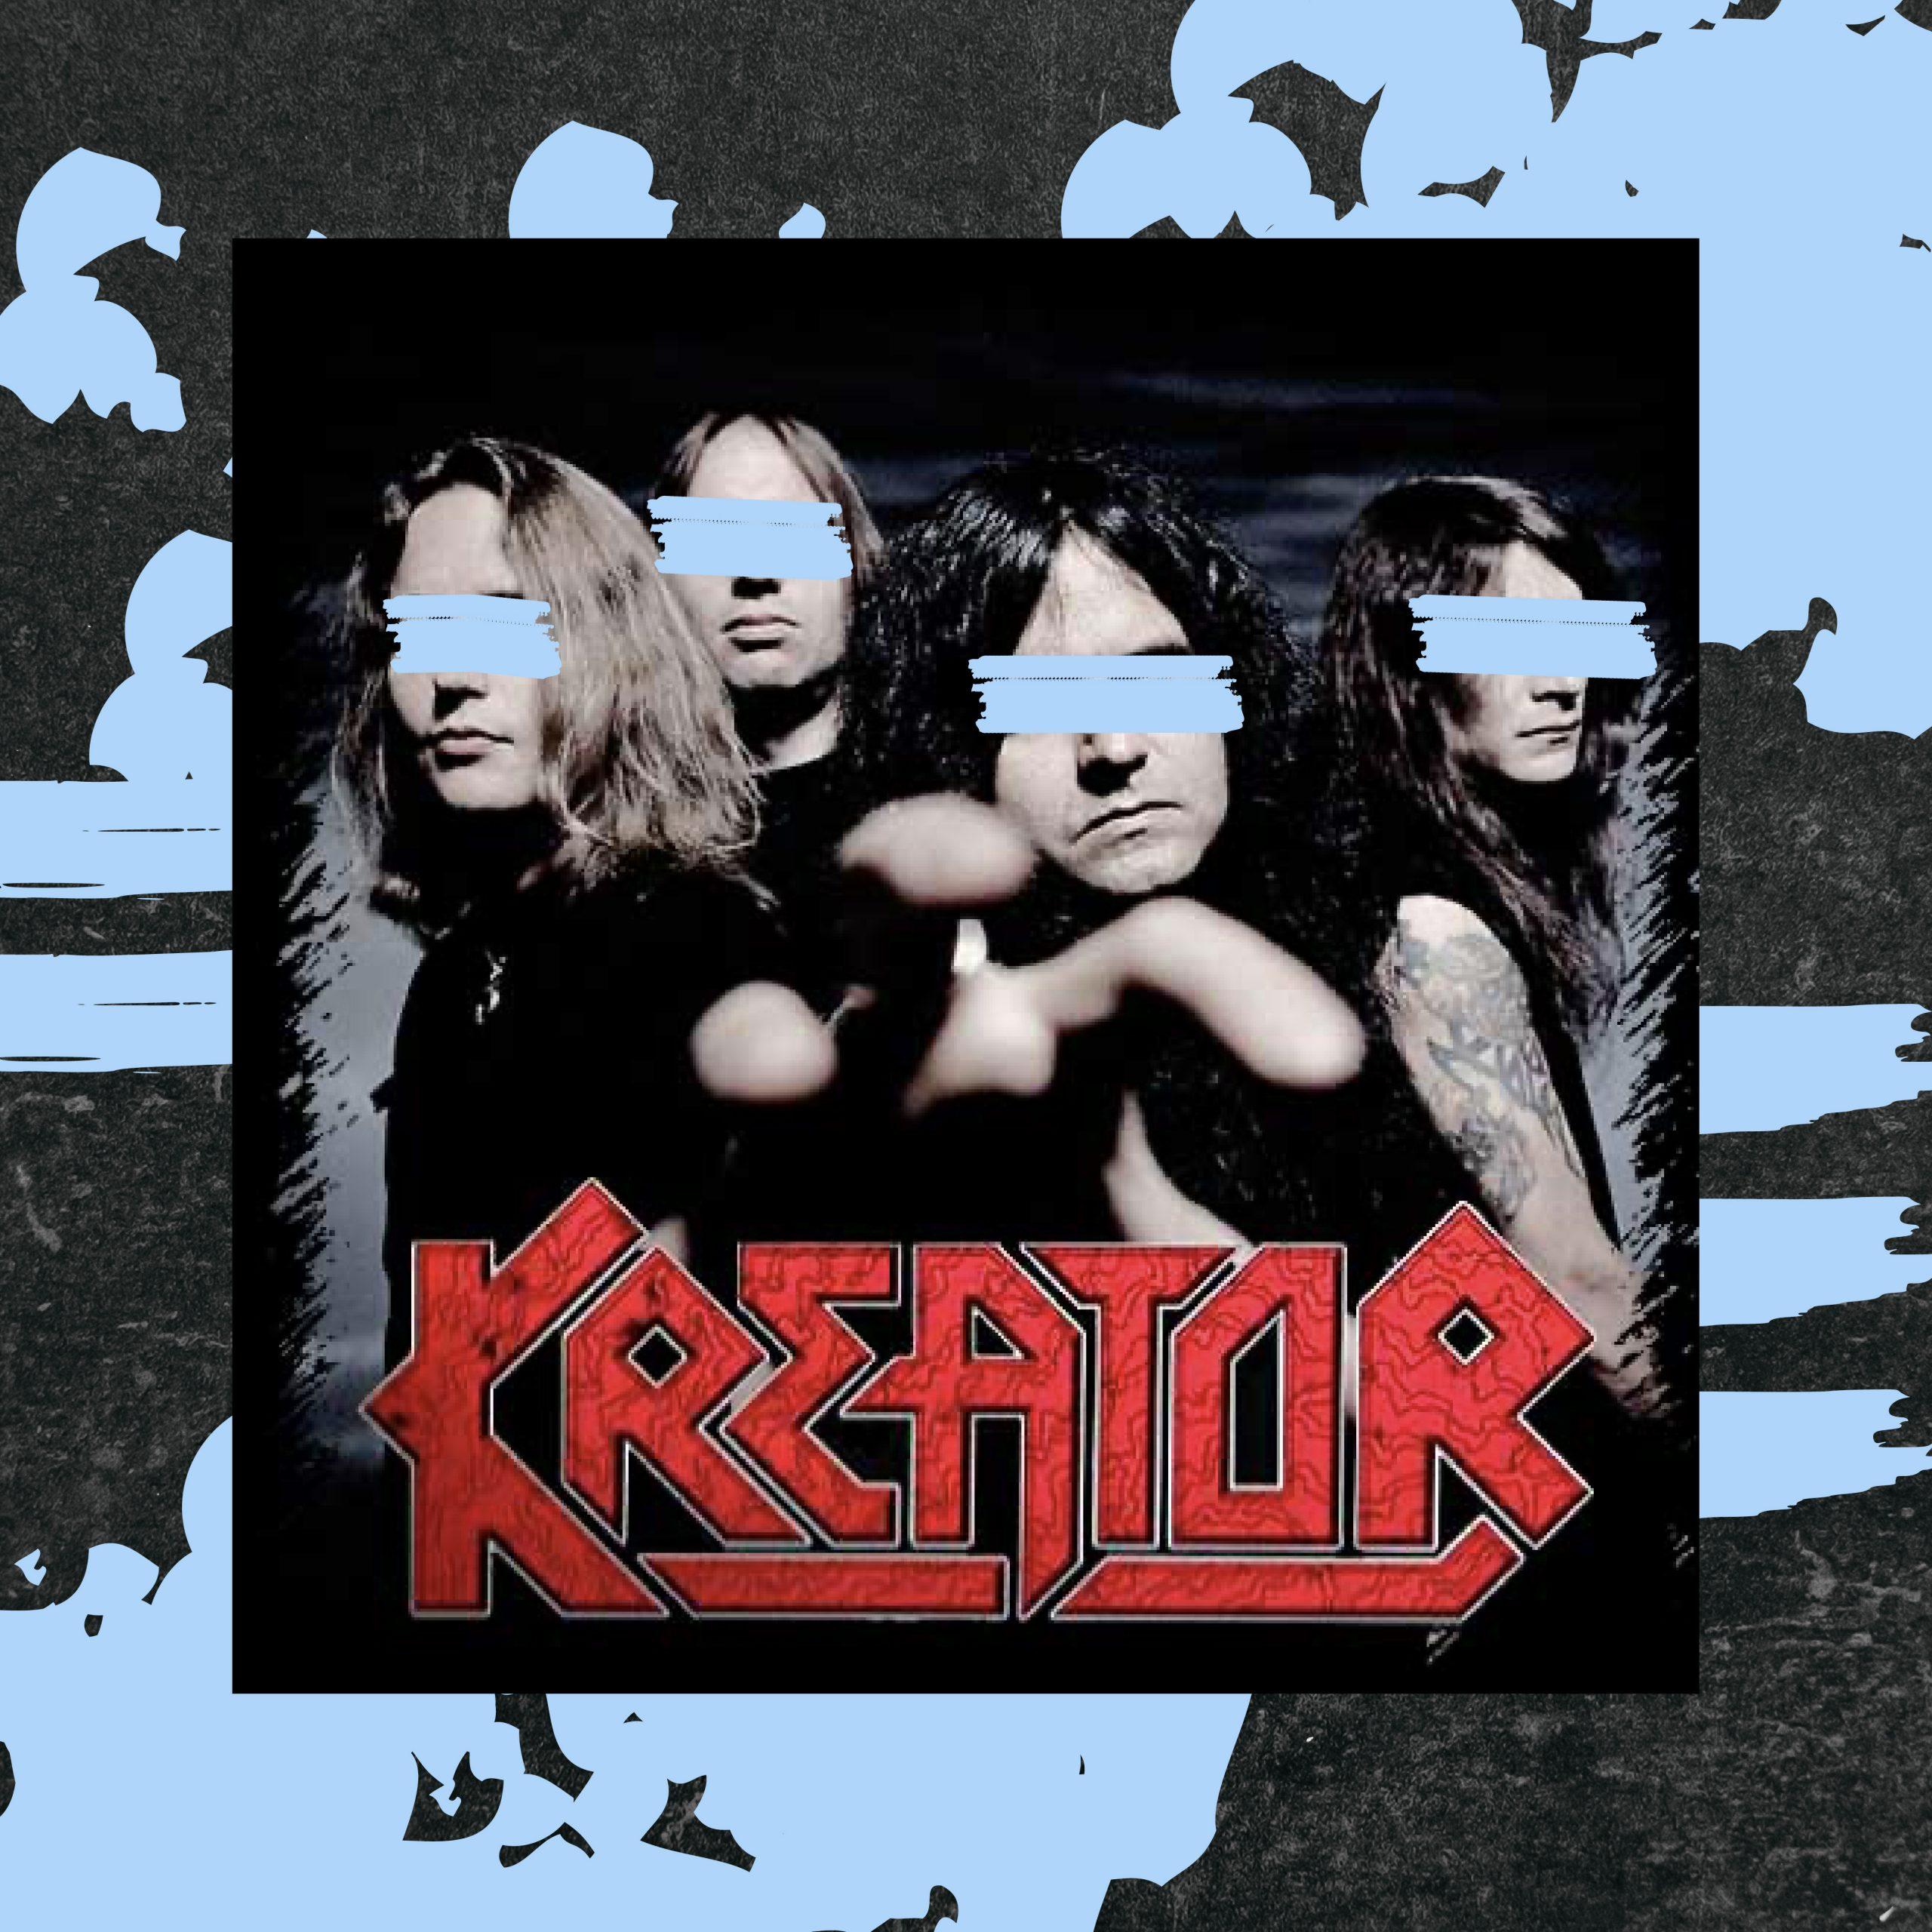 kreator-01